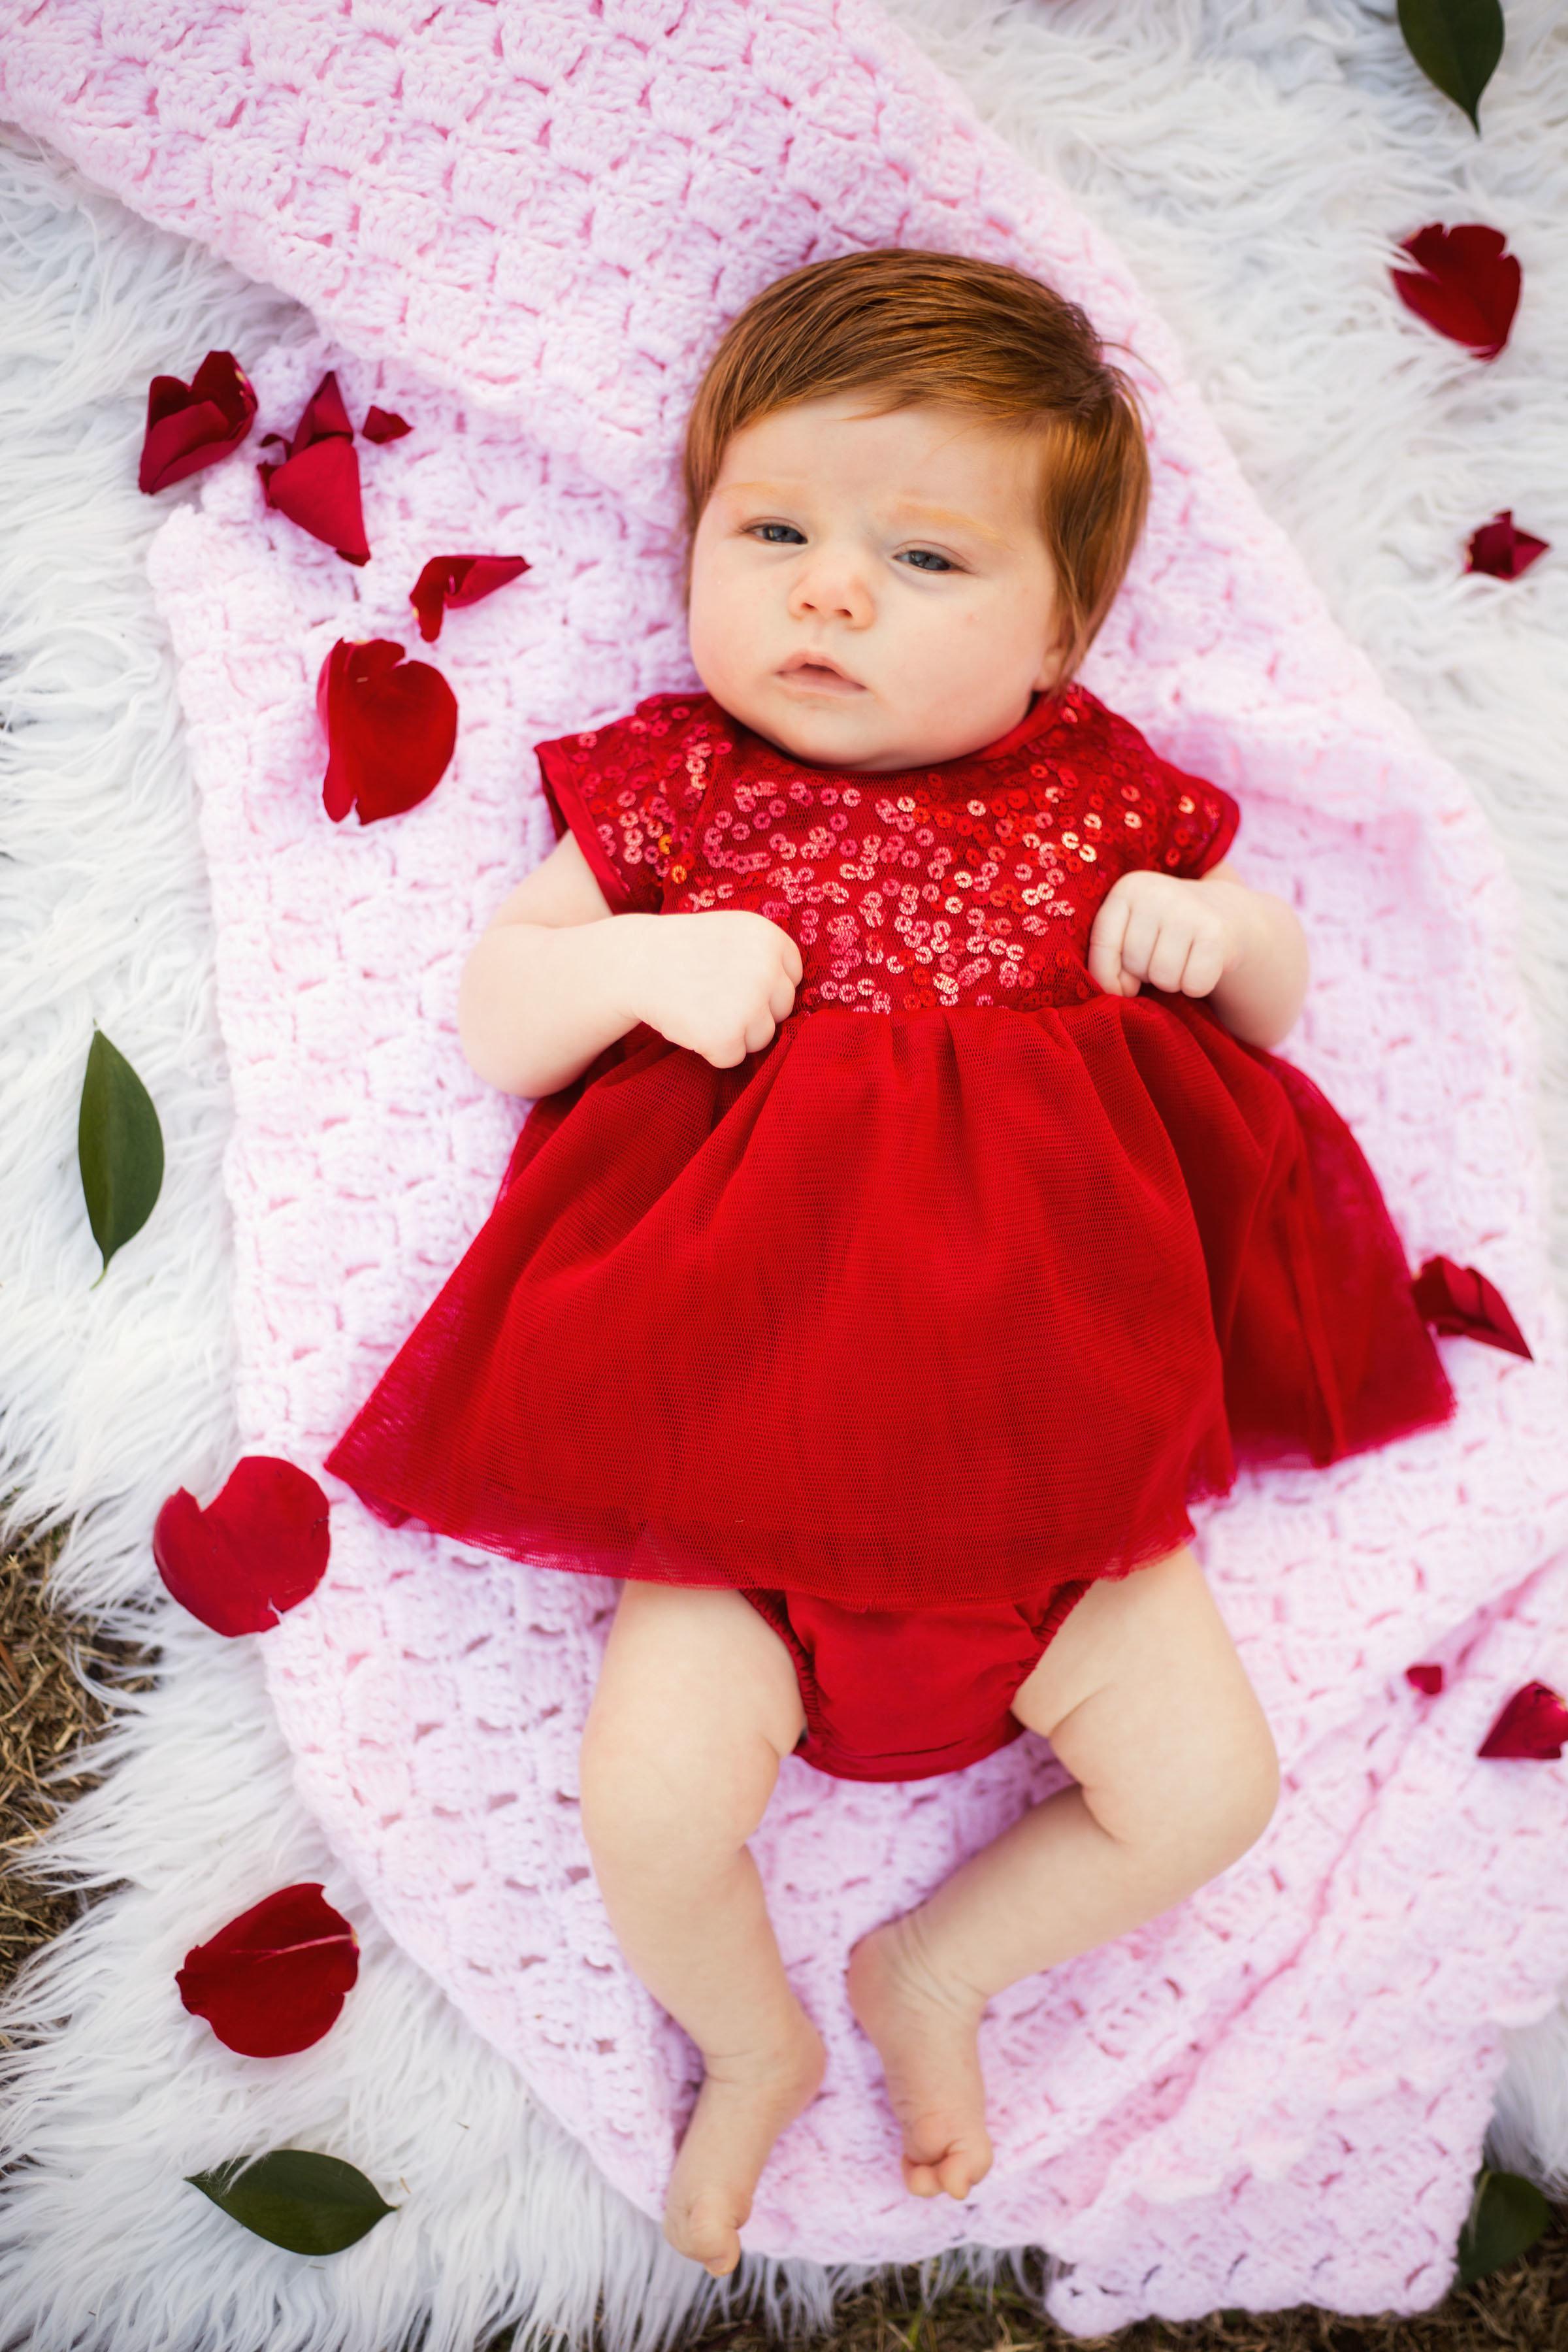 Wilmington-Newborn-Photographer-Tiffany-Abruzzo-Jordyn-29.jpg